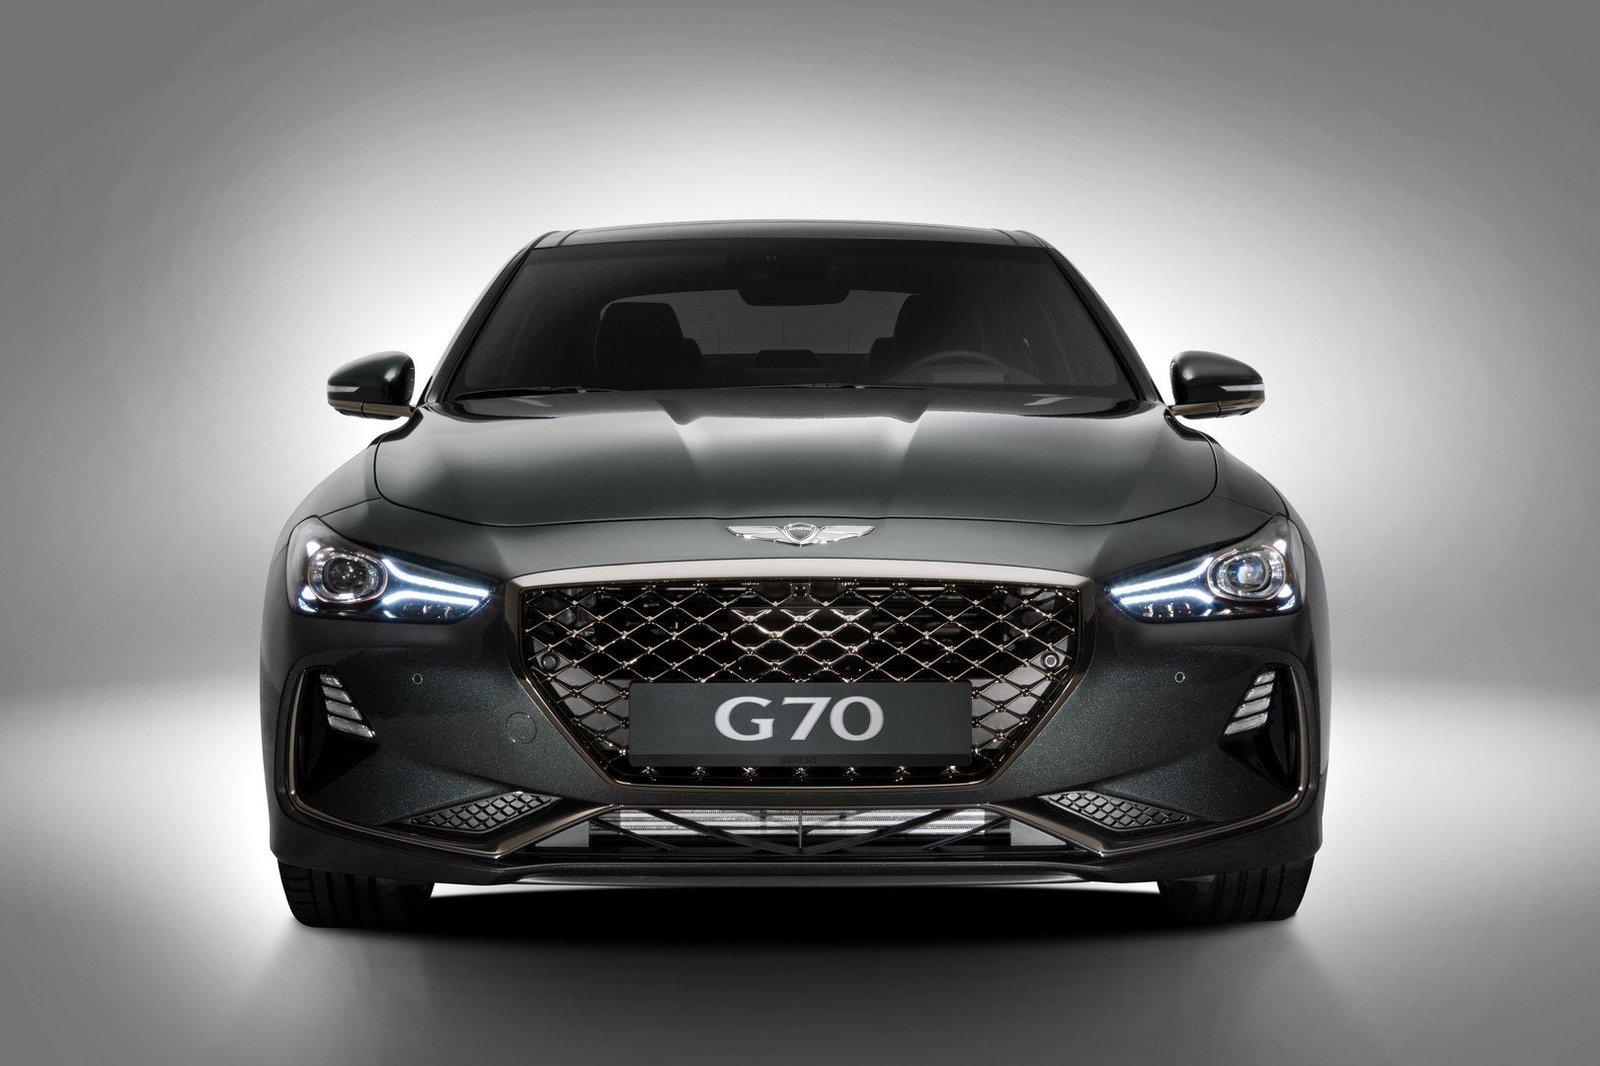 у корейцев появился конкурент 3 Series и C Class Genesis G70